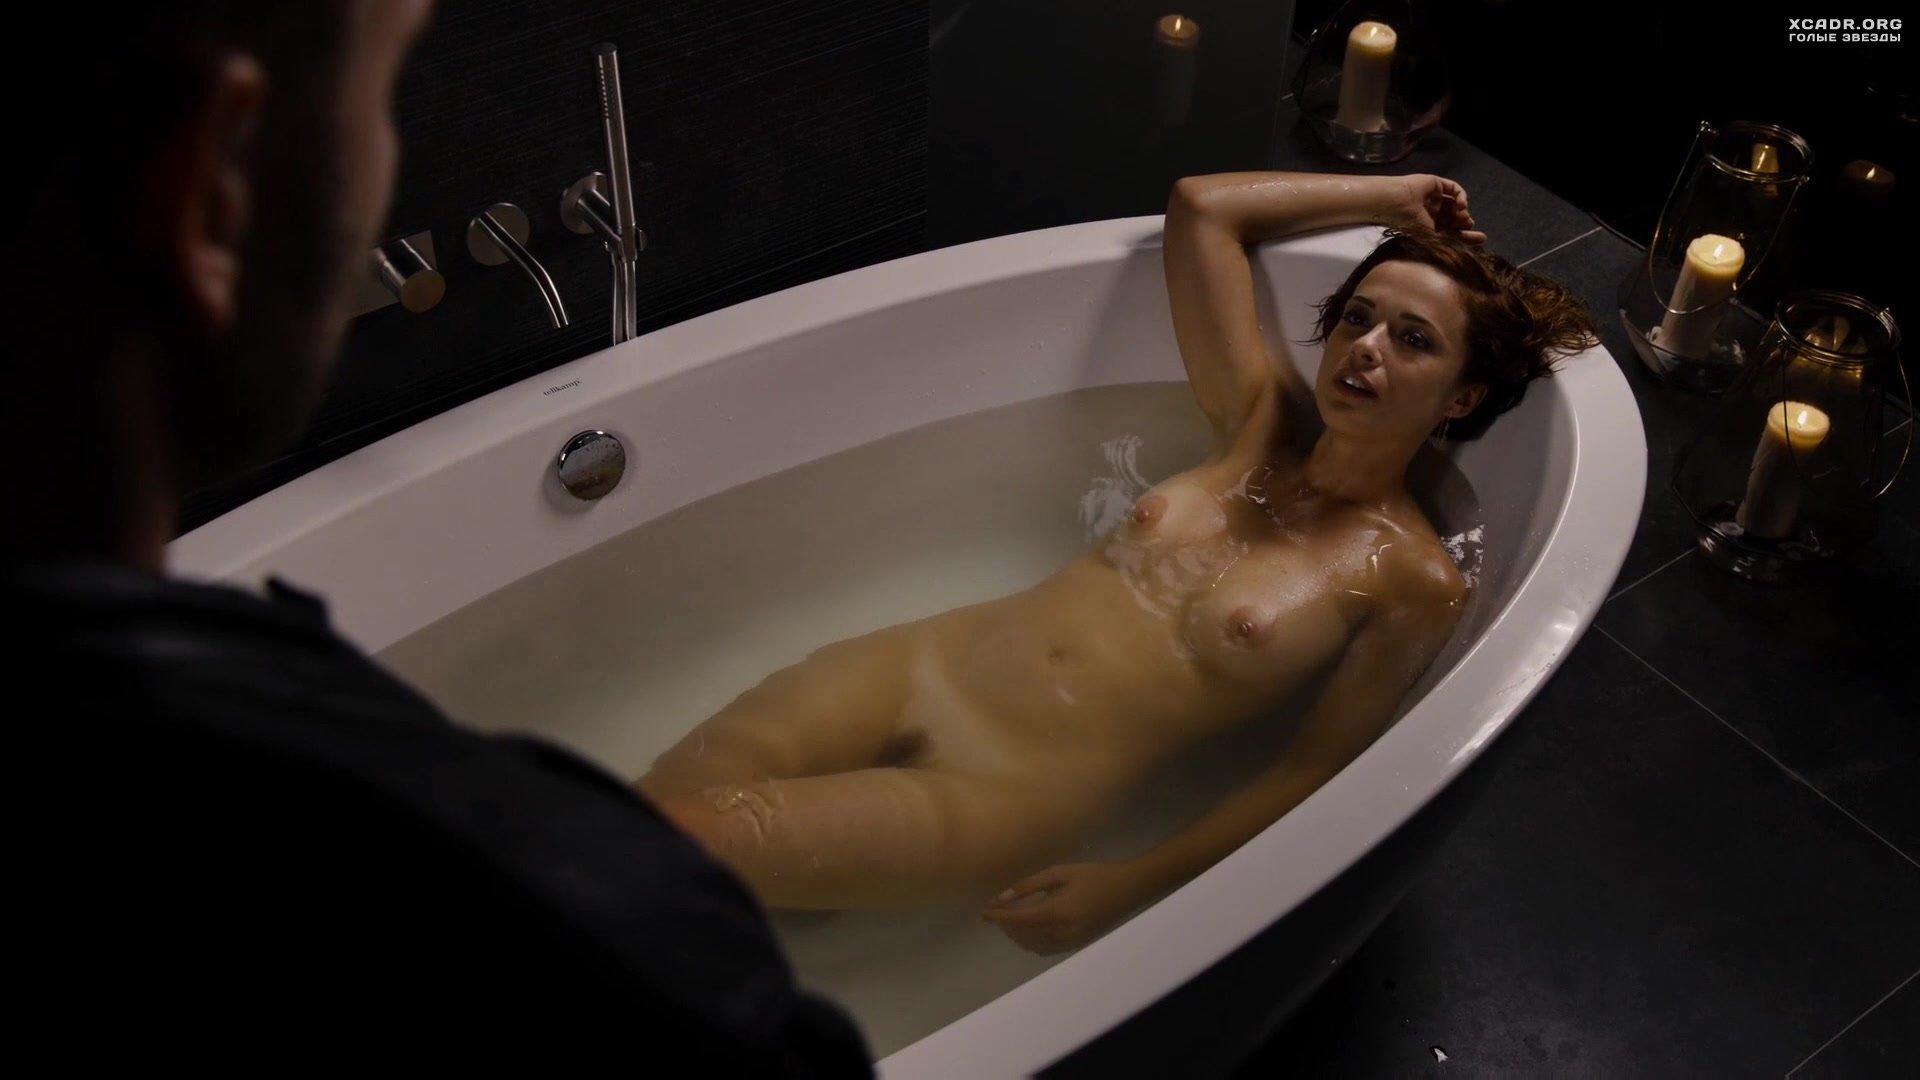 Nude marin hinkle fully nude pics brave elinor bisexual